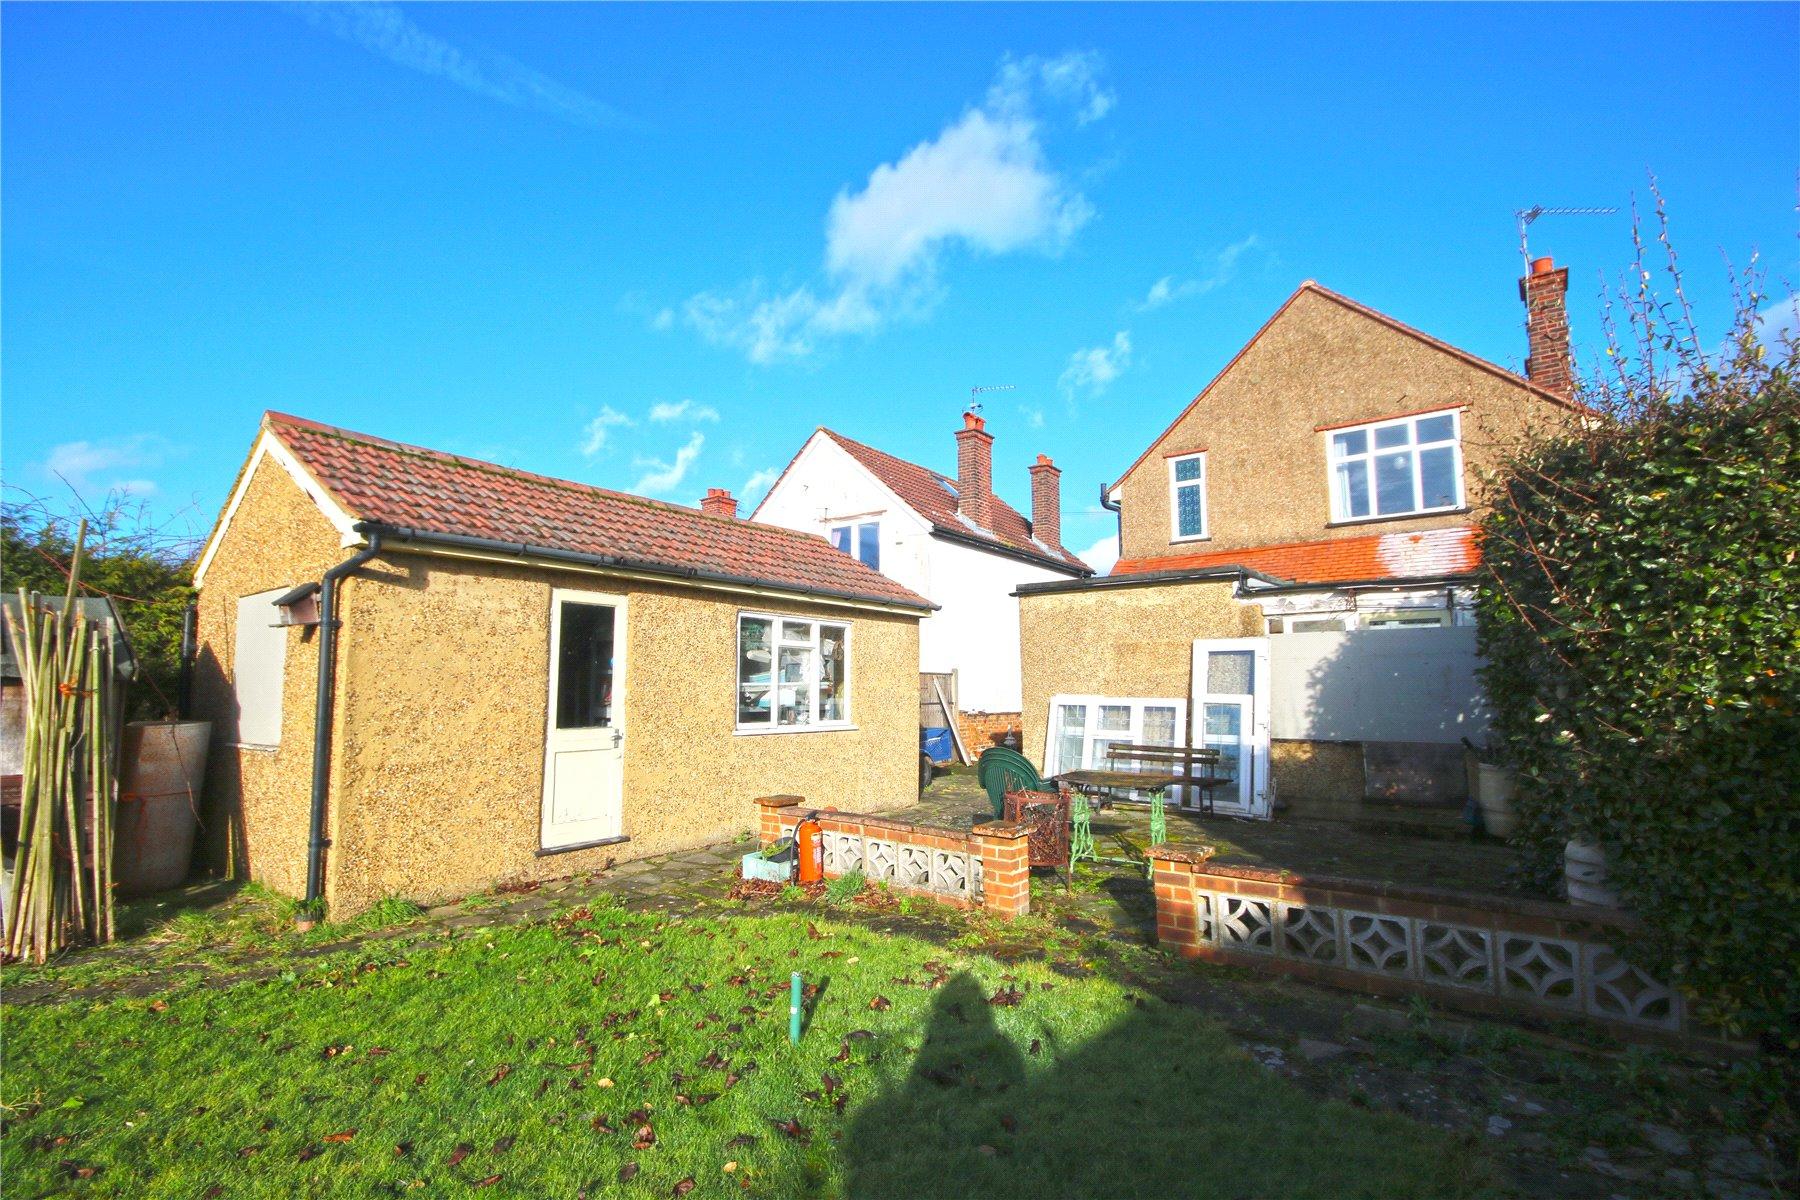 3 Bedrooms Detached House for sale in Grove Road, Chertsey, Surrey, KT16